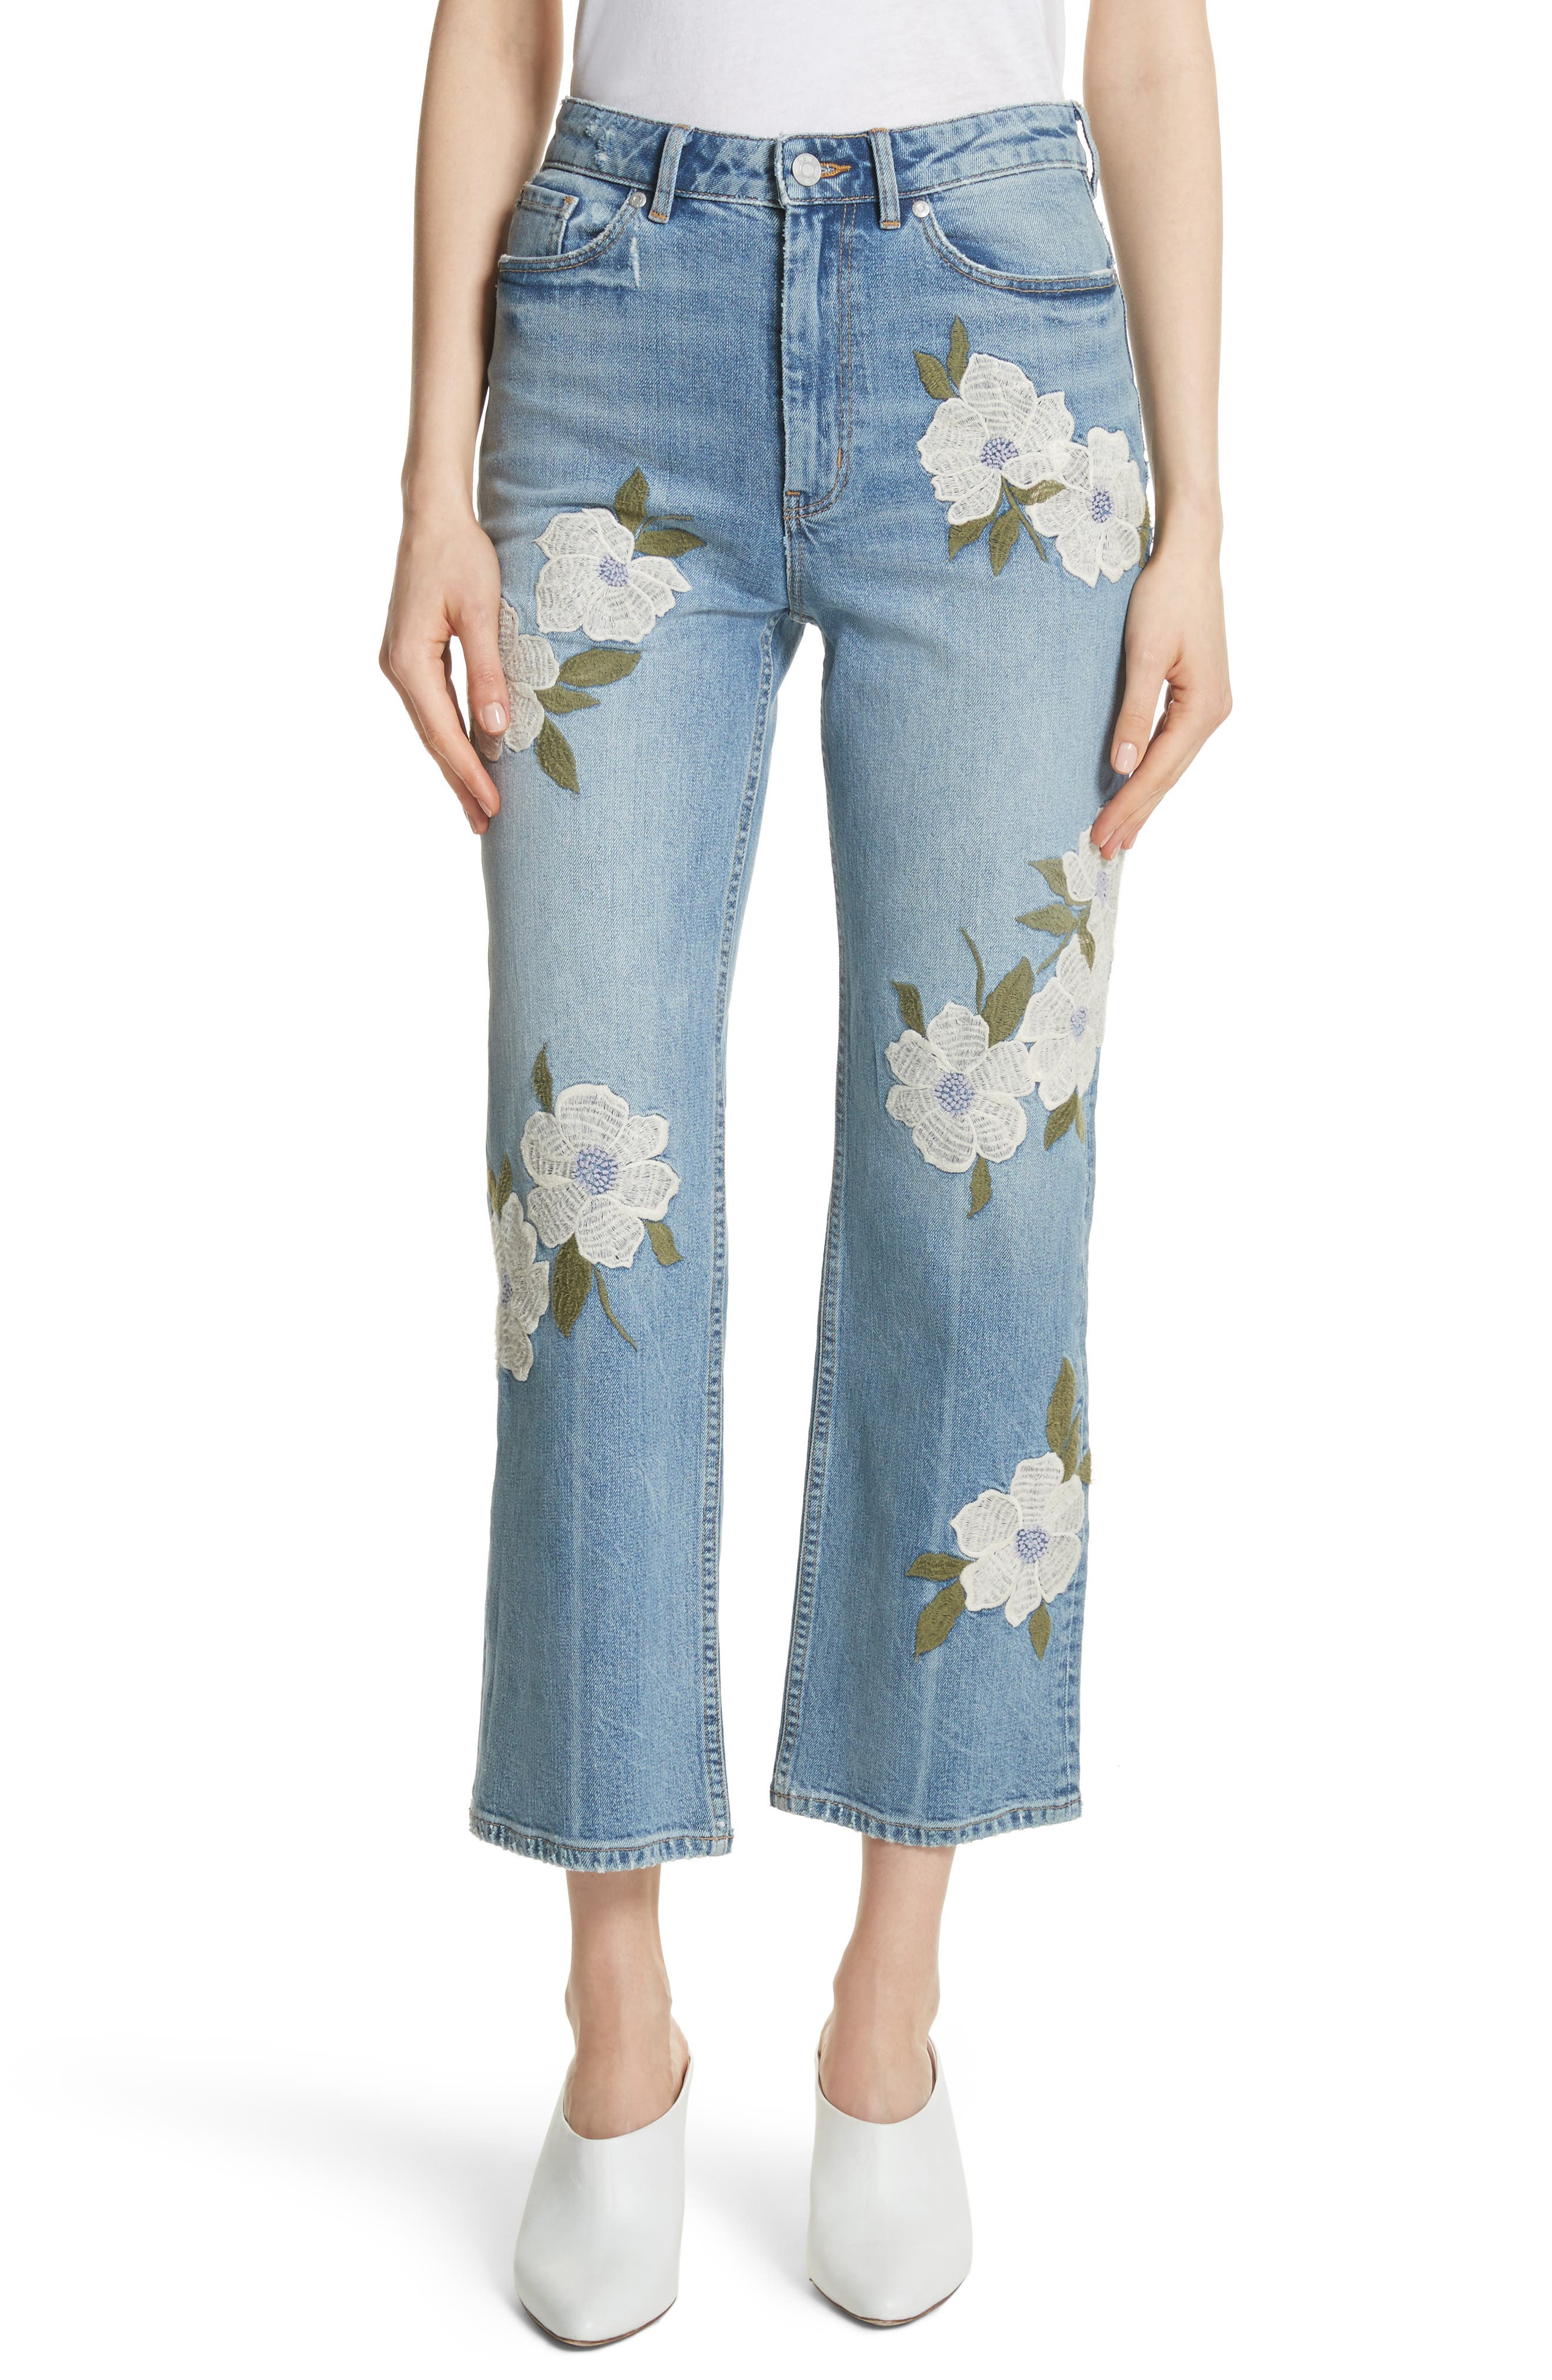 La Vie Rebecca Taylor Anais Floral Embroidered Crop Jeans (Rive)